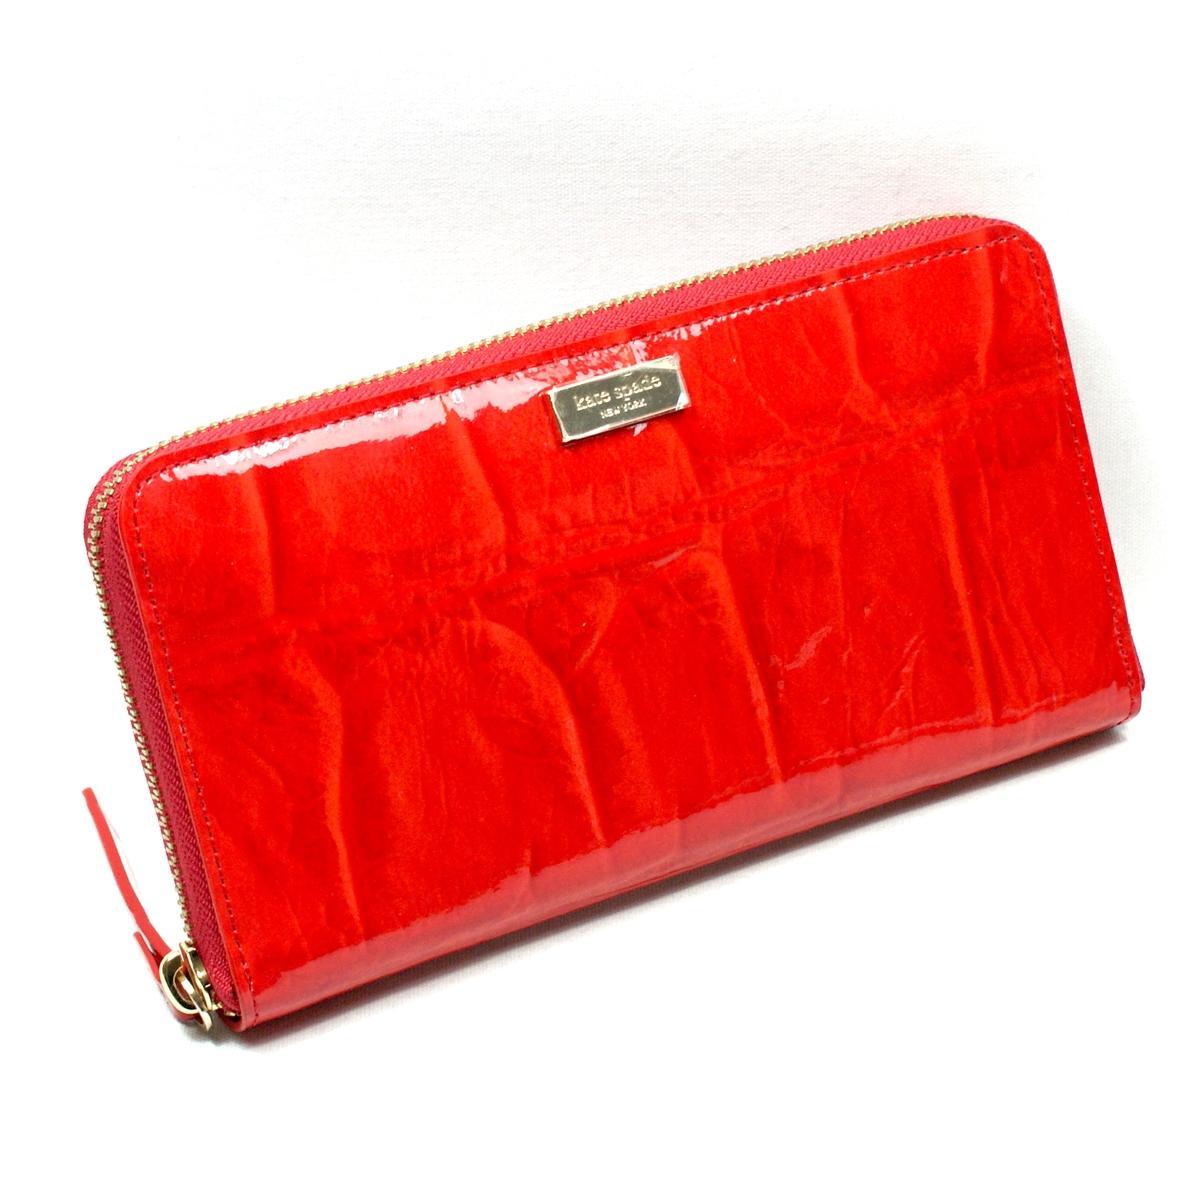 Kate Spade Neda Knightsbridge Red Zip Around Wallet